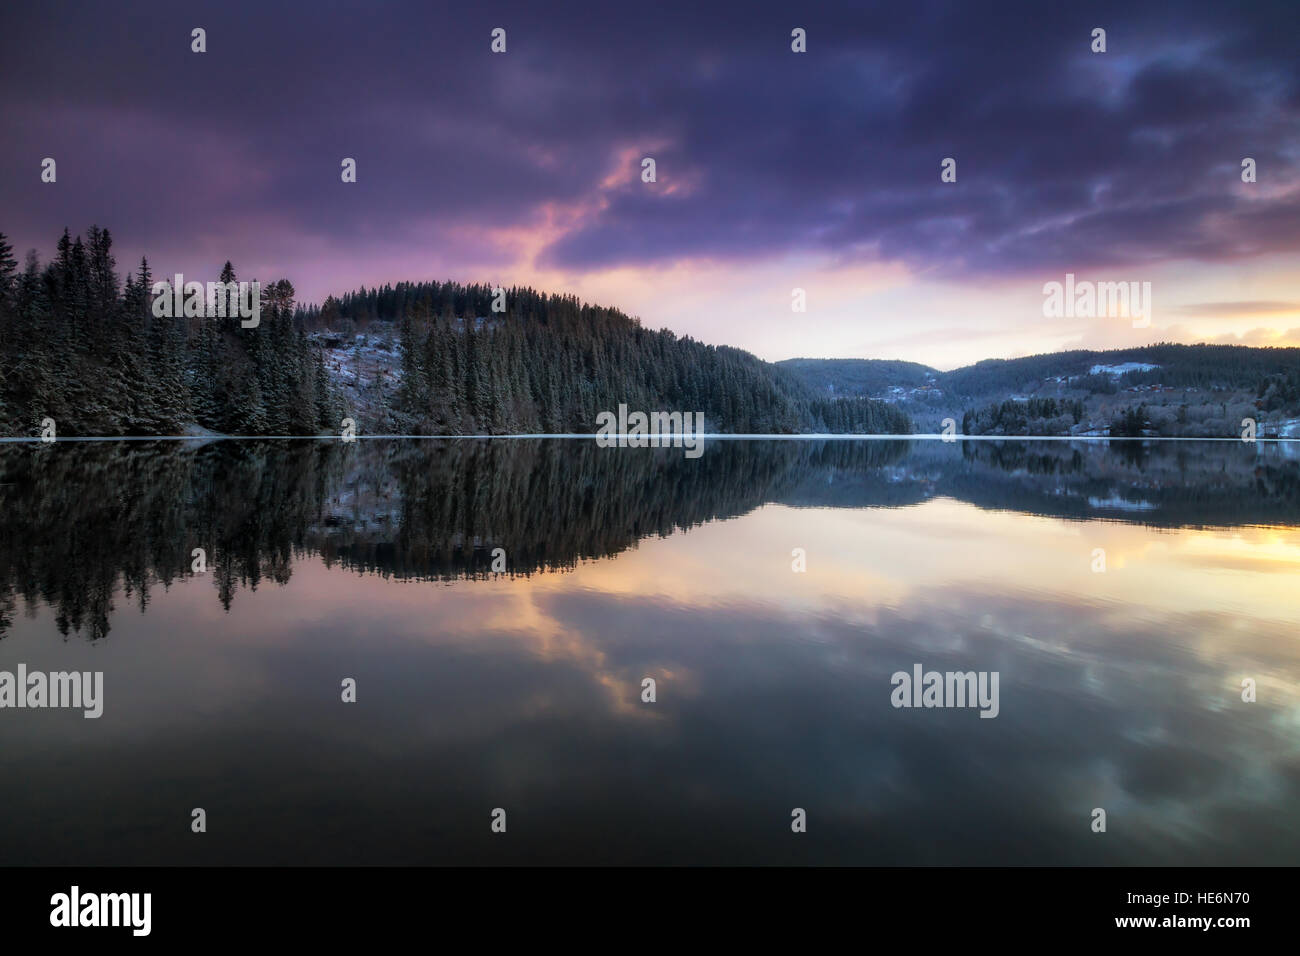 Litlvatnet lake water reflections, Trondheim, Norway - Stock Image